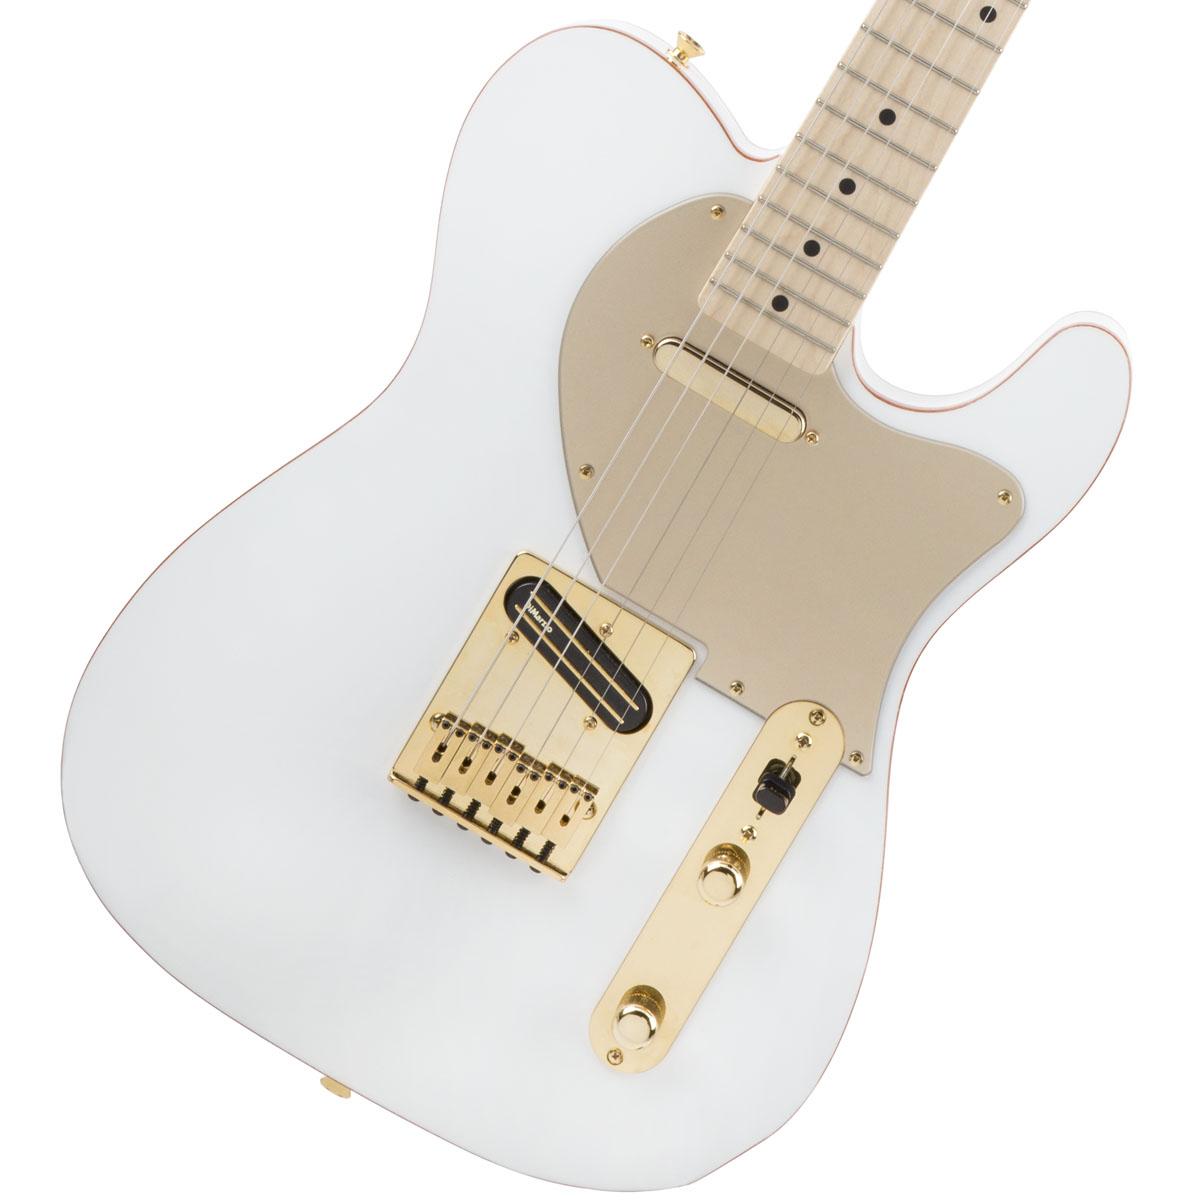 Fender/ Arctic/ HARUNA TELECASTER Arctic White 《カスタムショップのお手入れ用品を進呈 White/+671038200》【YRK】, ブランドショップ ラッシュモール:5ee48abf --- rodebyjakt.se